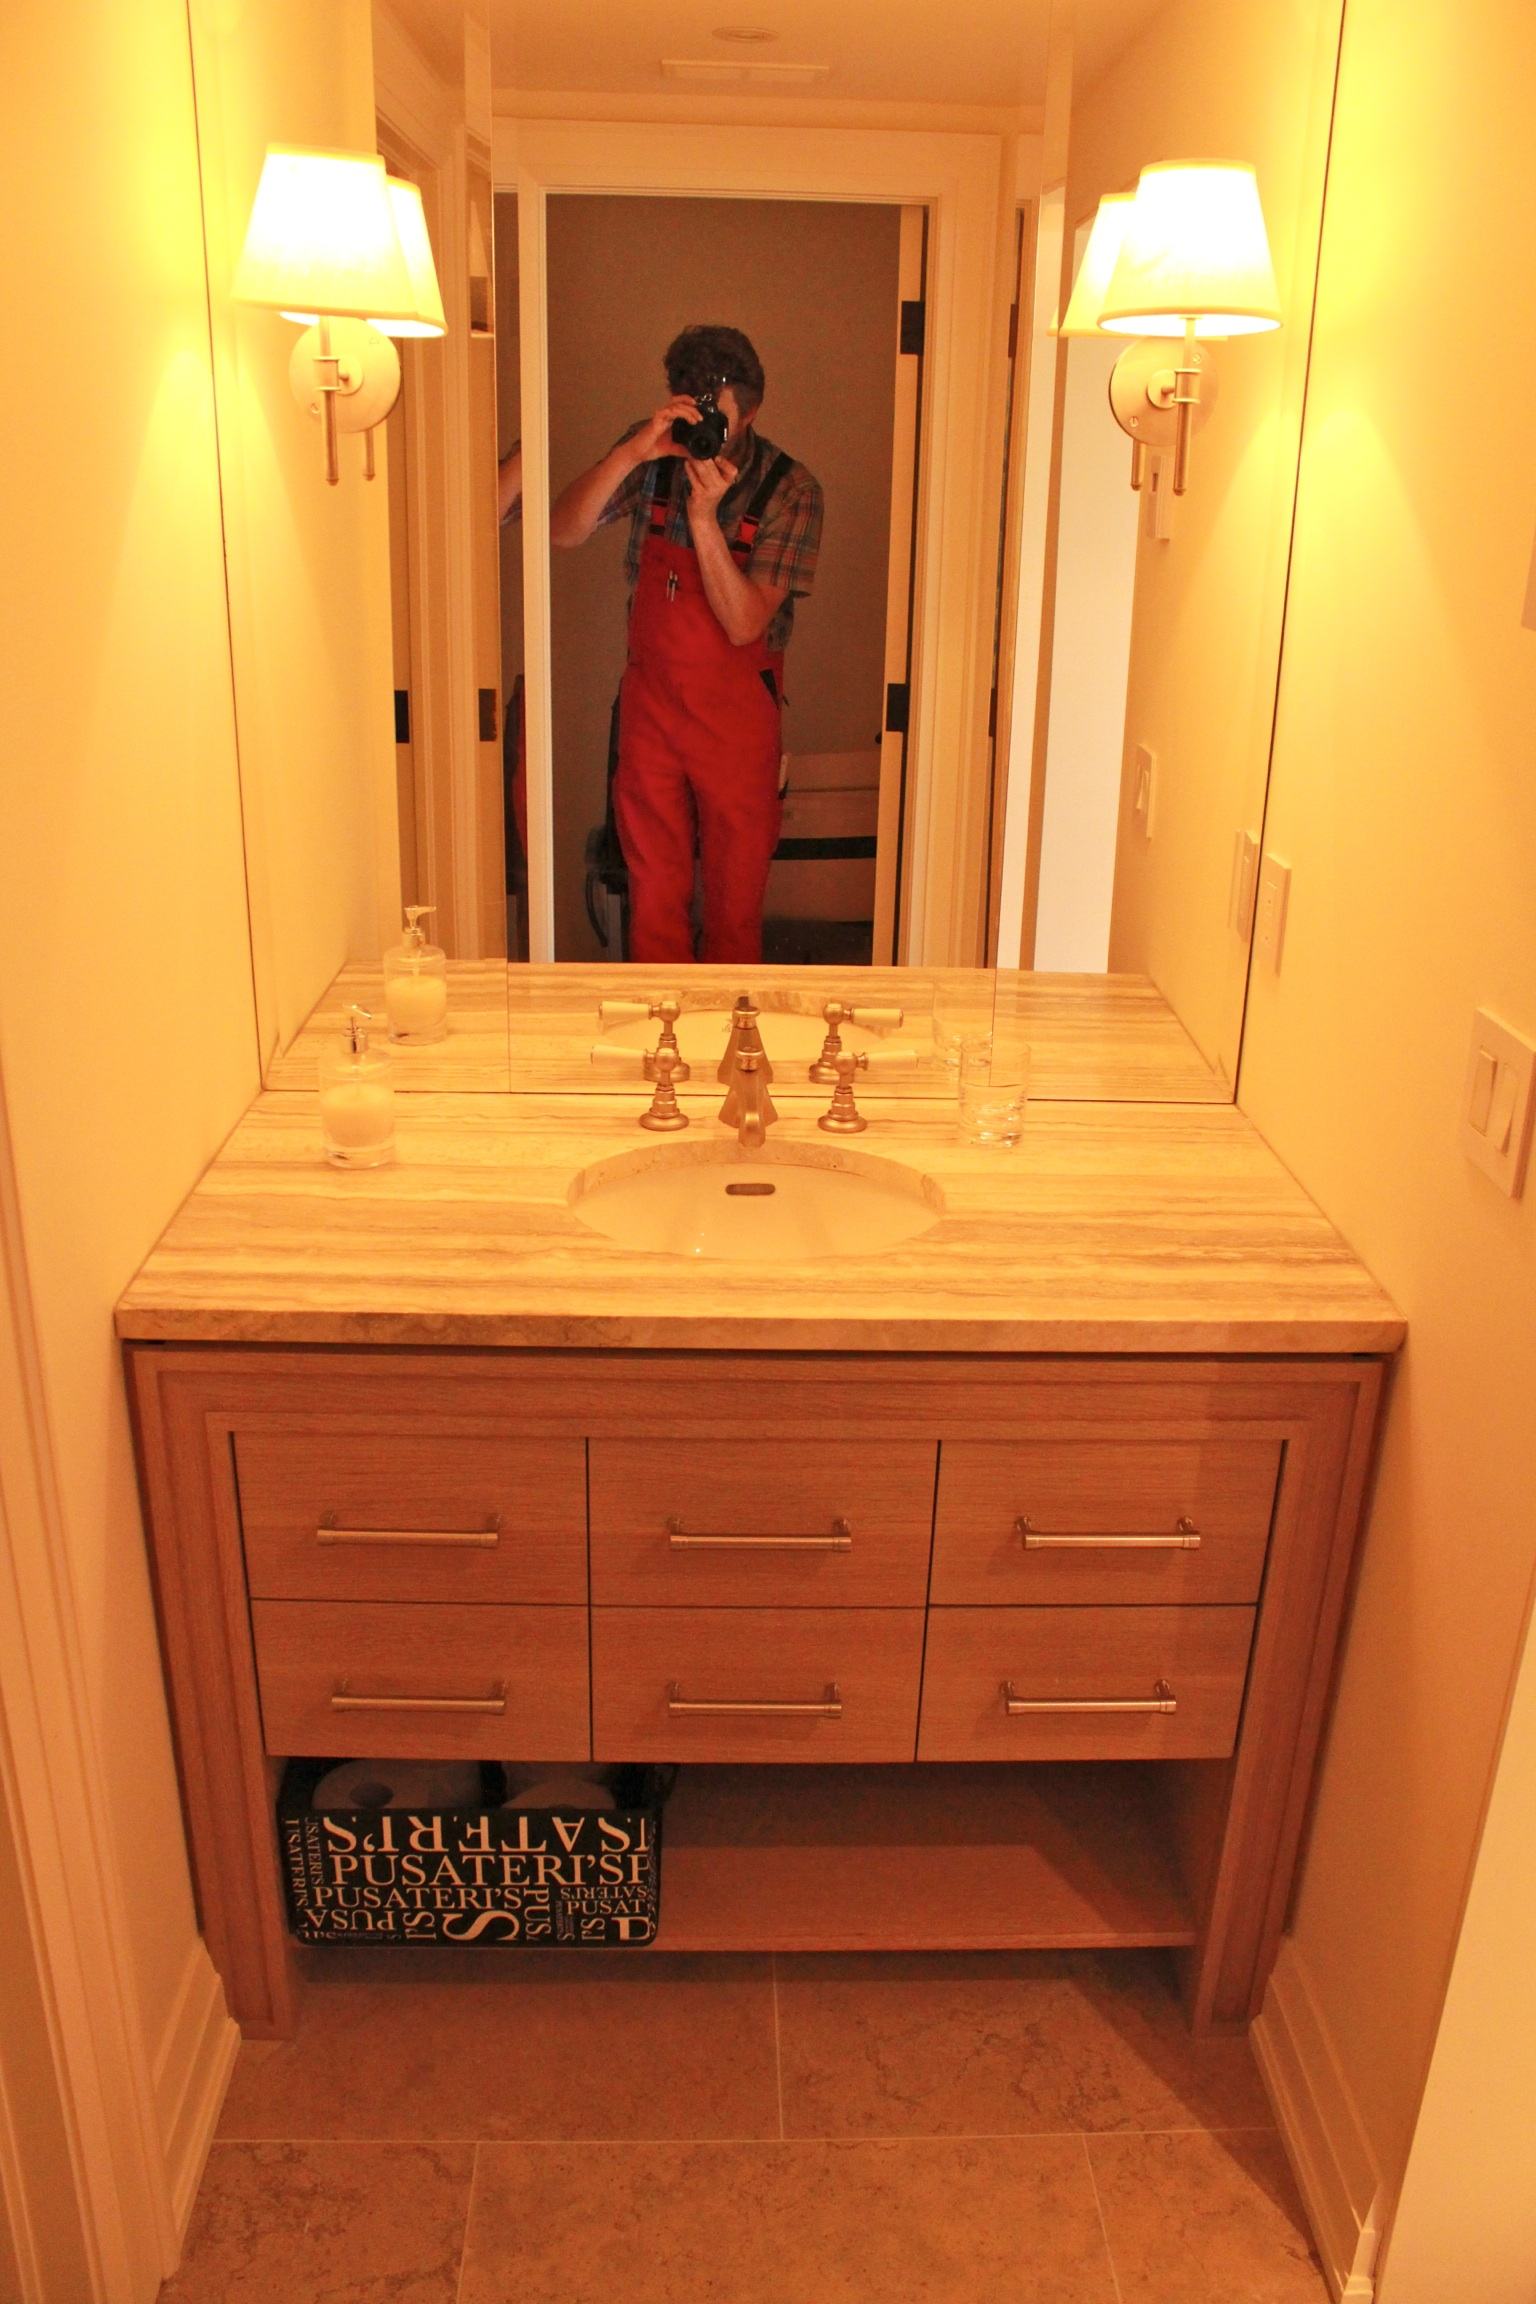 Uli in bathroom picture.jpg